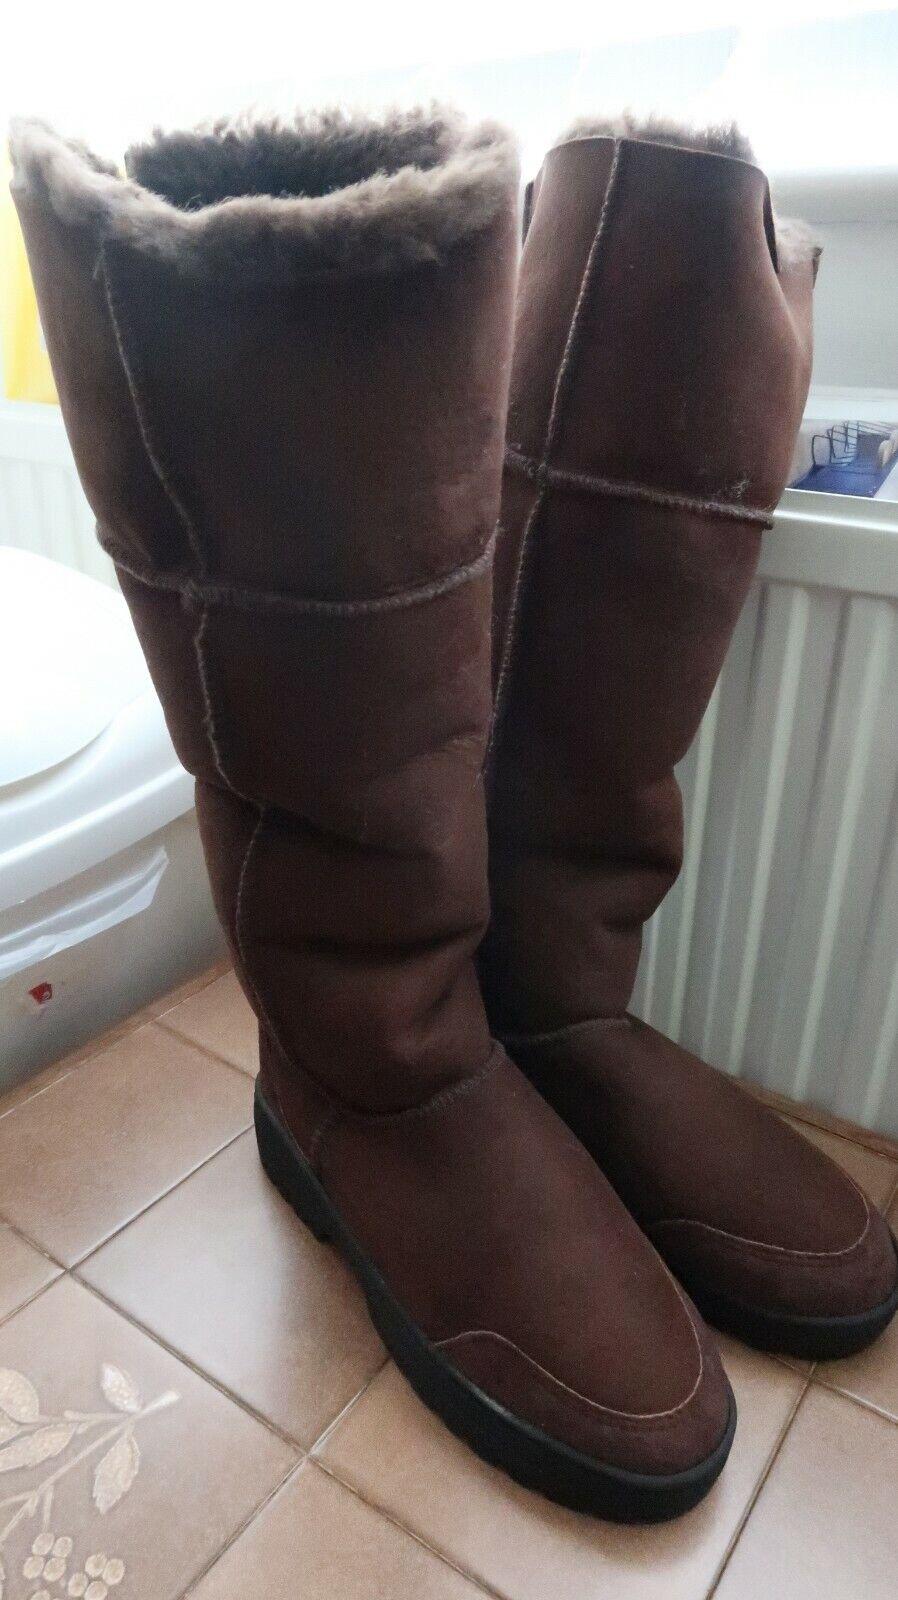 Musketeer Ultimate Sheepskin Boots Chocolate - UK 6